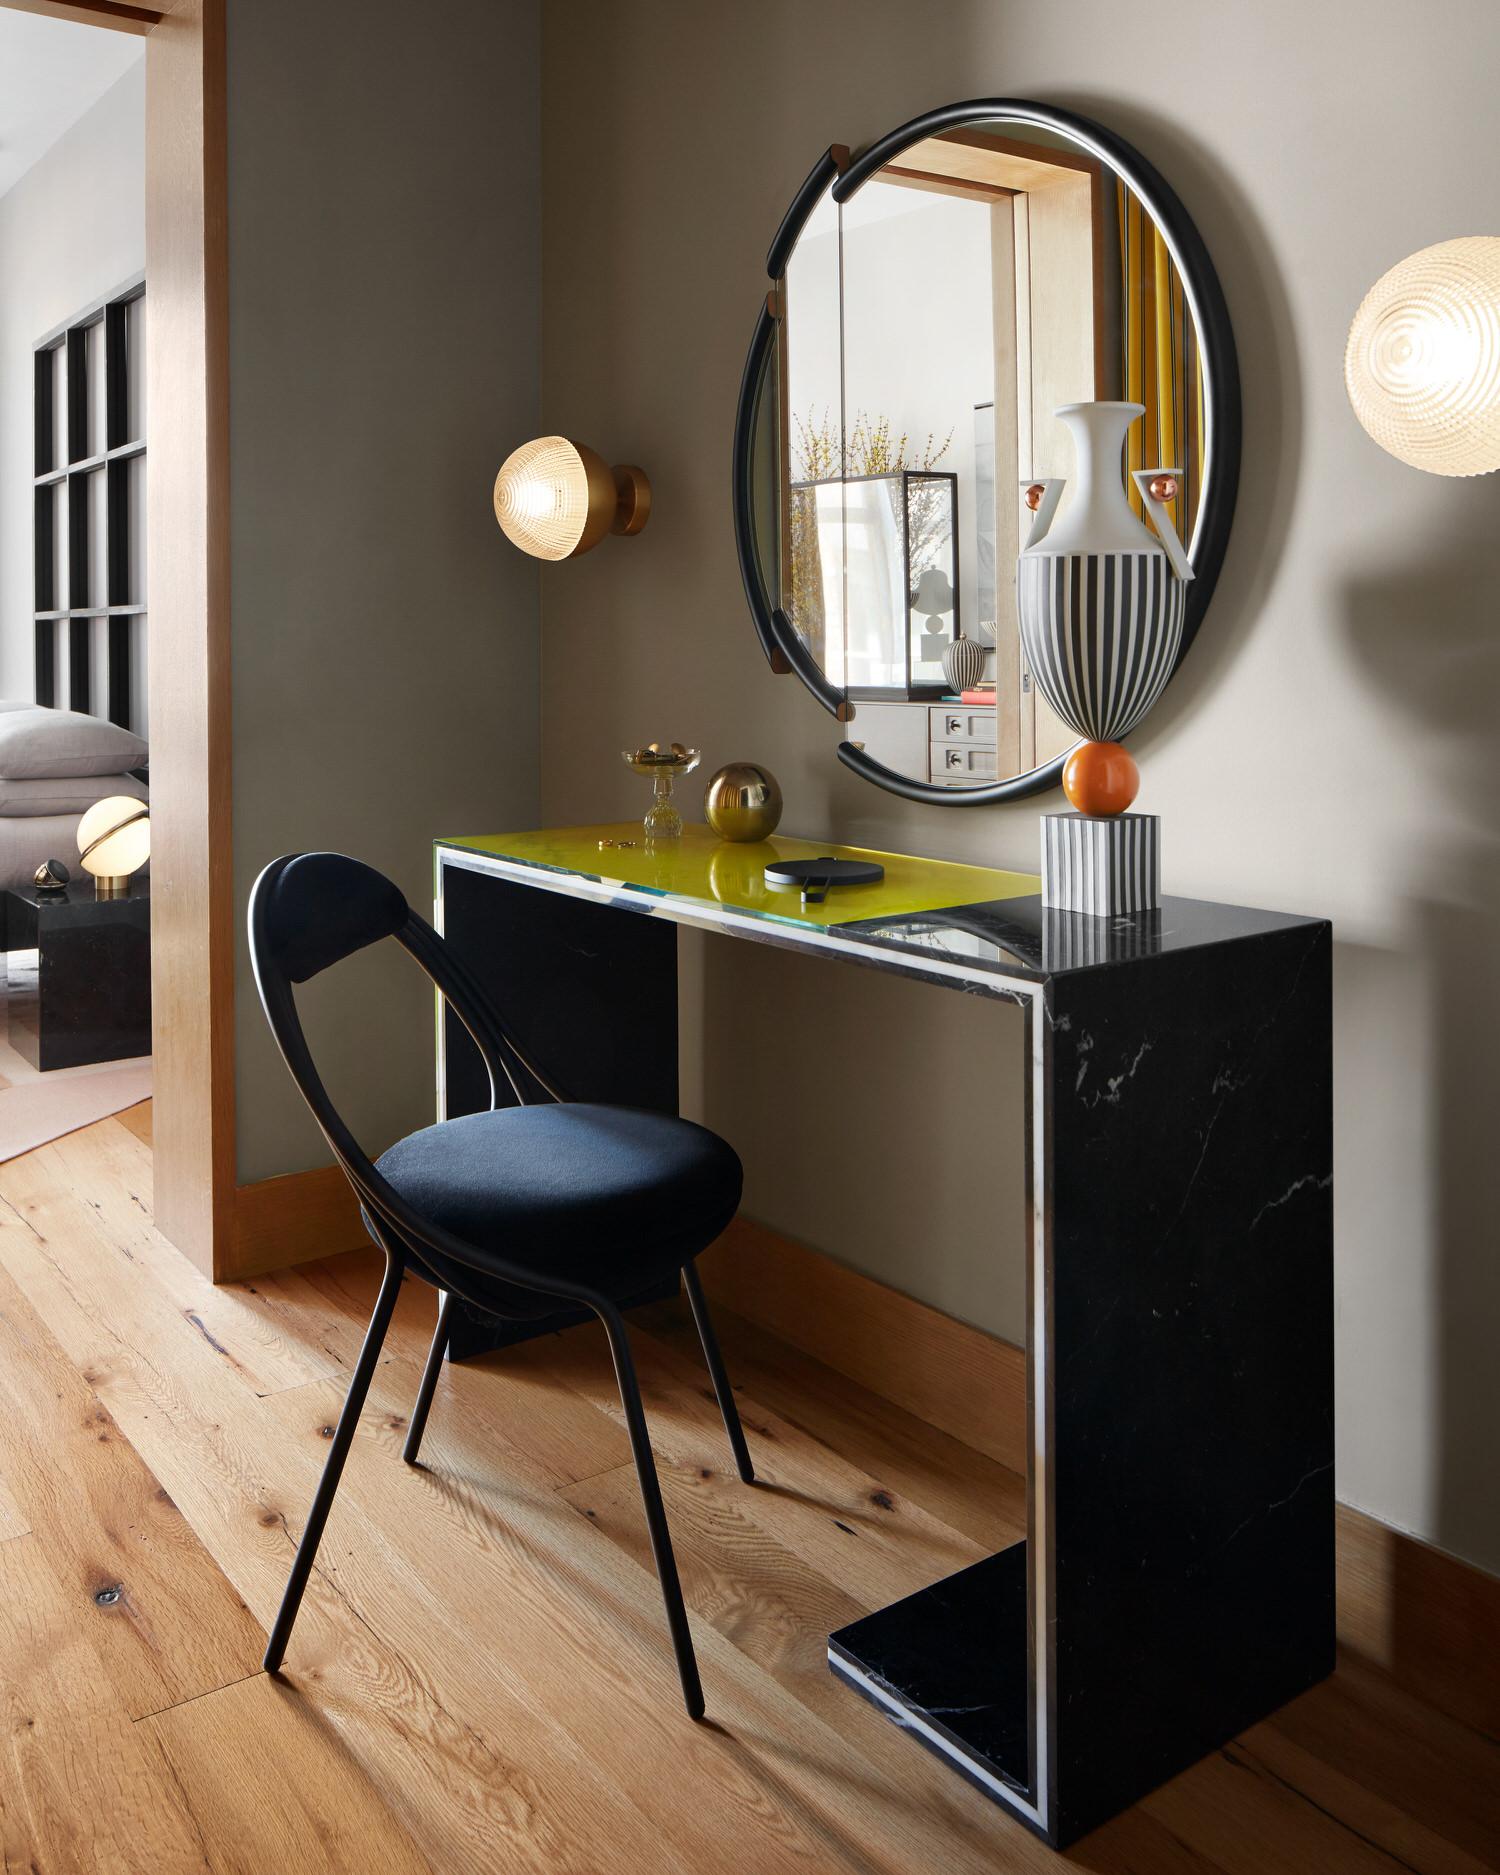 Lee Broom Penthouse New York Dressing Room Photo Stephen Kent Johnson Yellowtrace 23